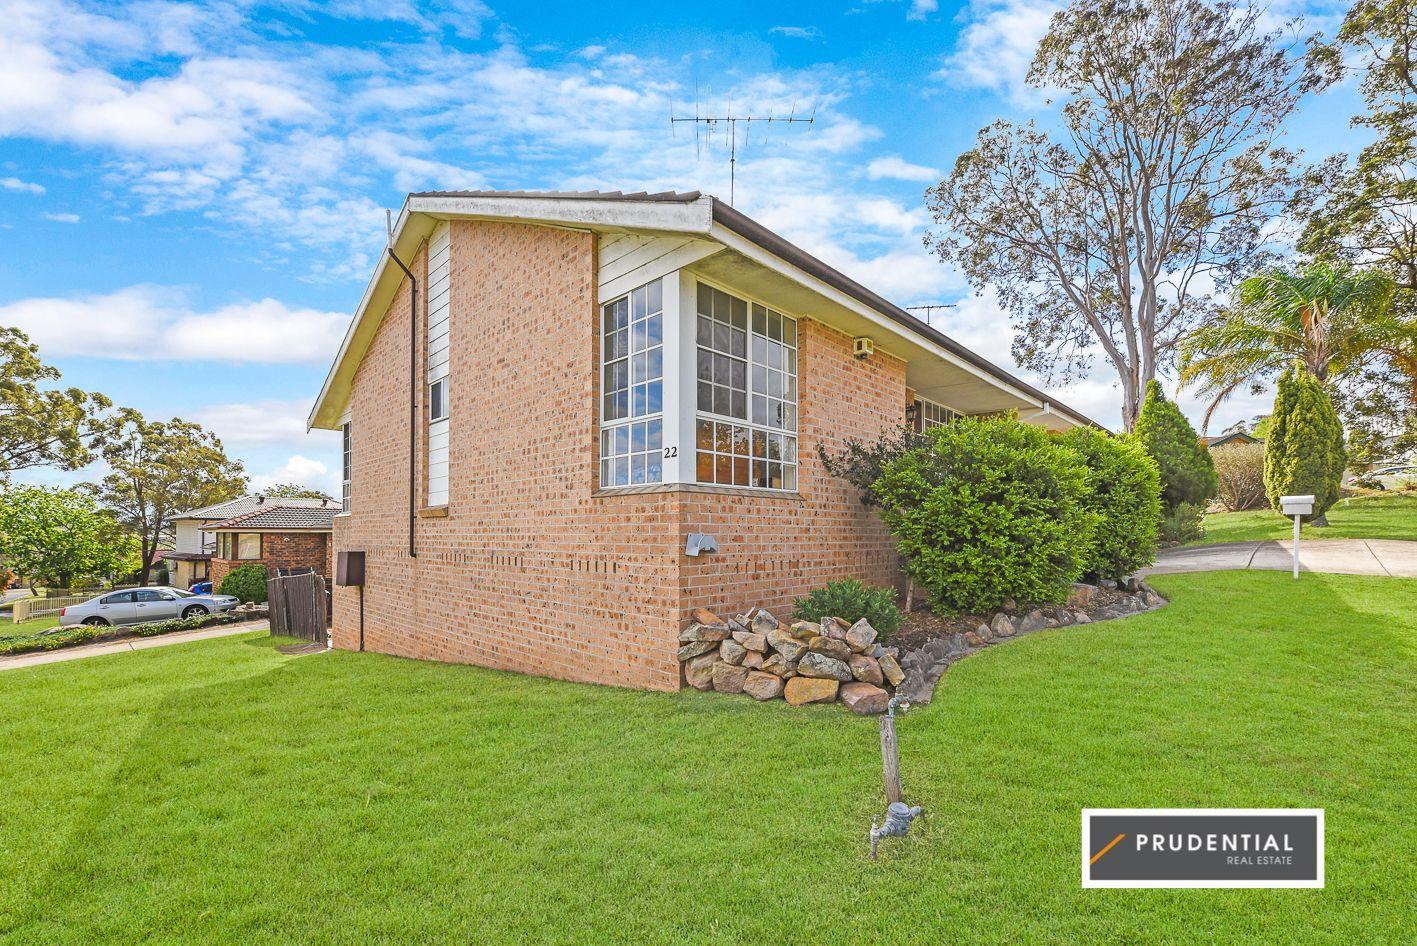 1/22 Aminya Crescent, Bradbury NSW 2560, Image 0